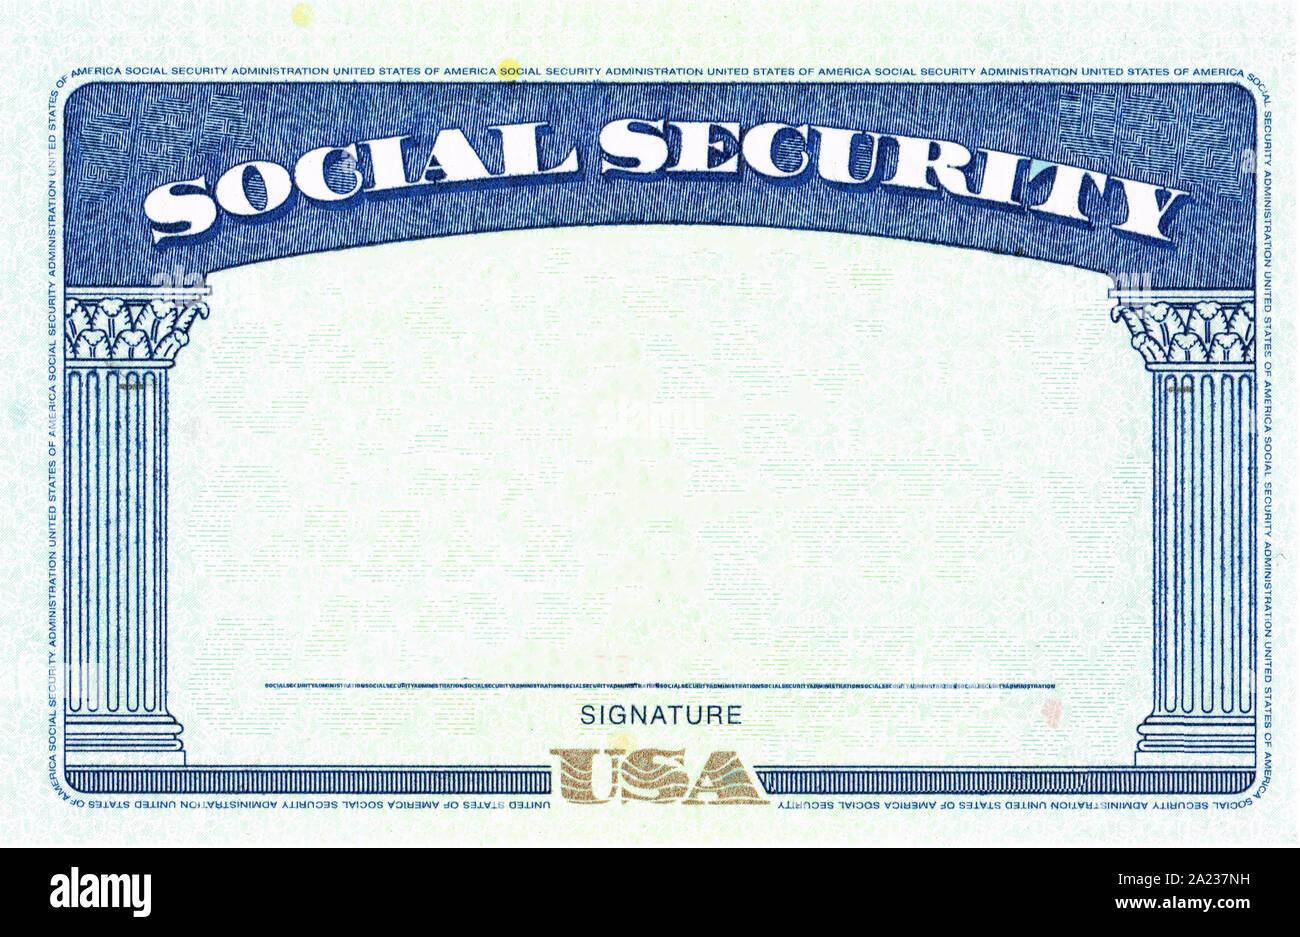 Blank Social Security Card Isolated High Resolution Stock Pertaining To Blank Social Security Card Template